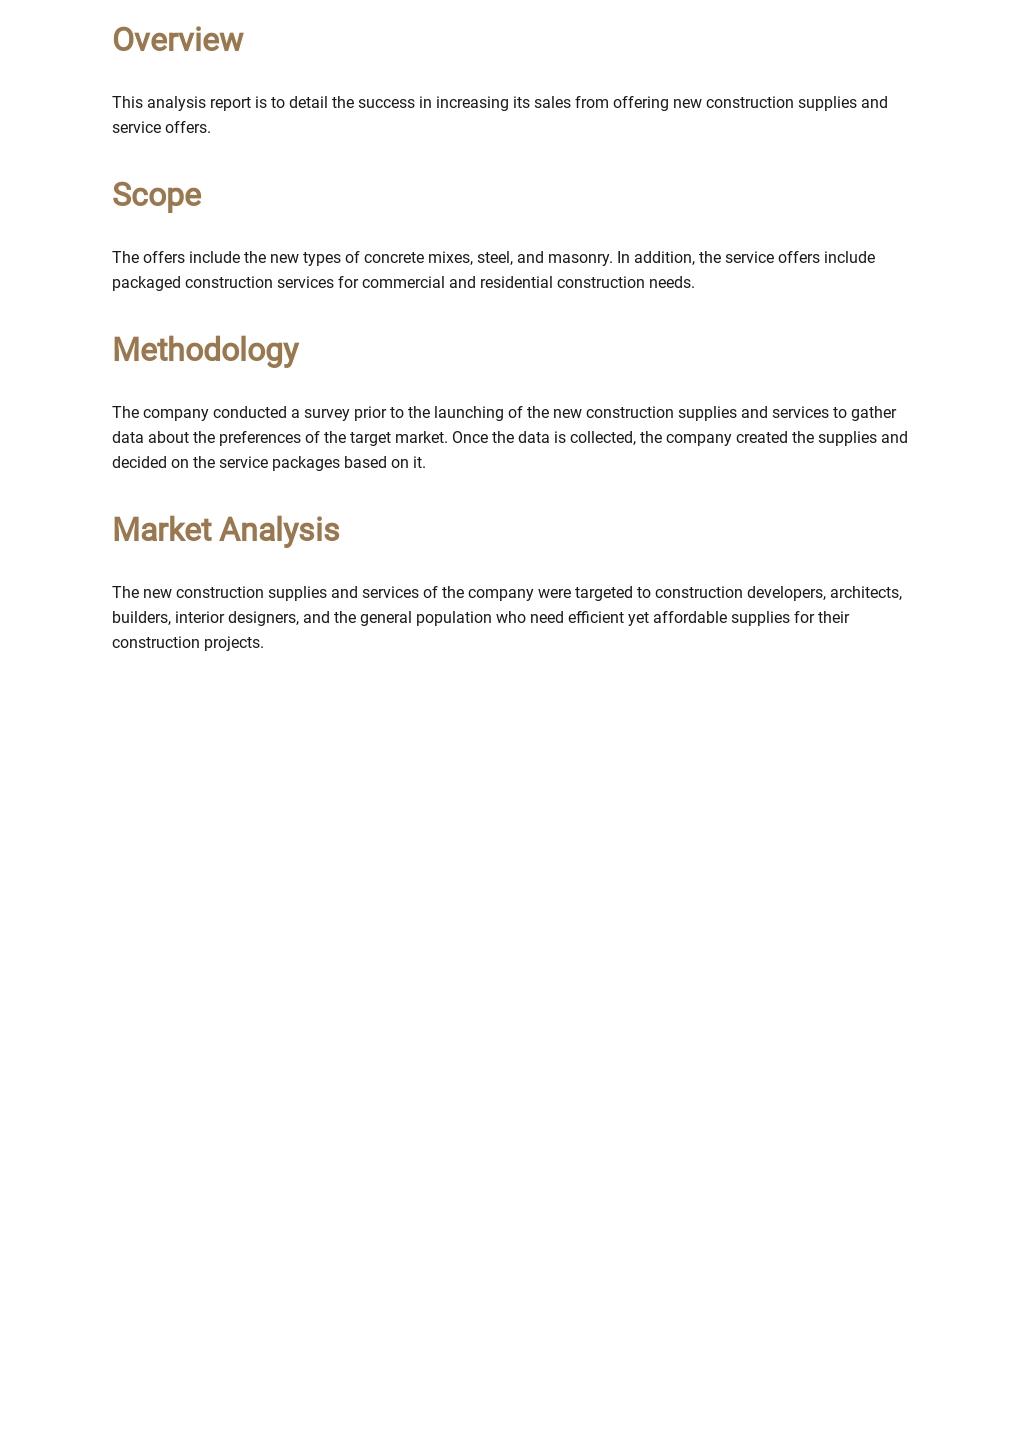 Sales Analysis Report Template 1.jpe